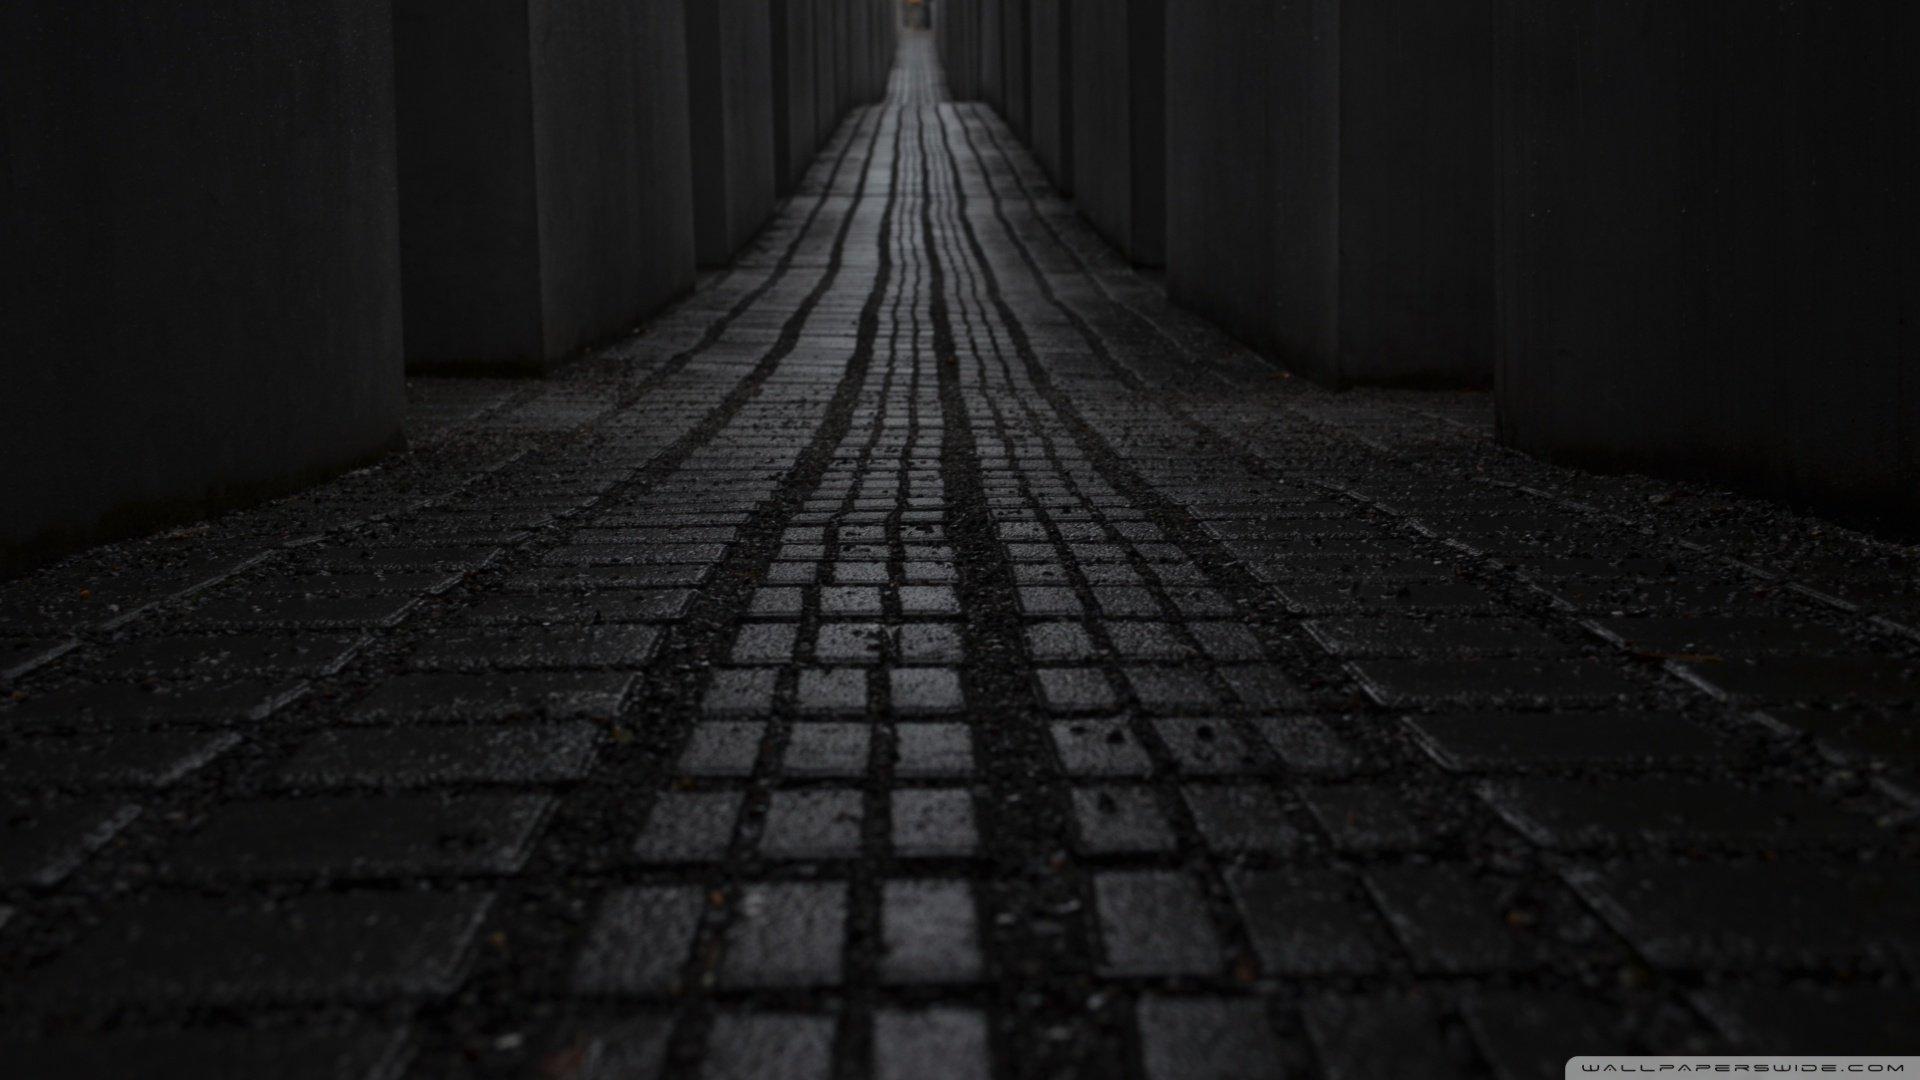 Dark Road Wallpaper 1920x1080 305991 Wallpaperup